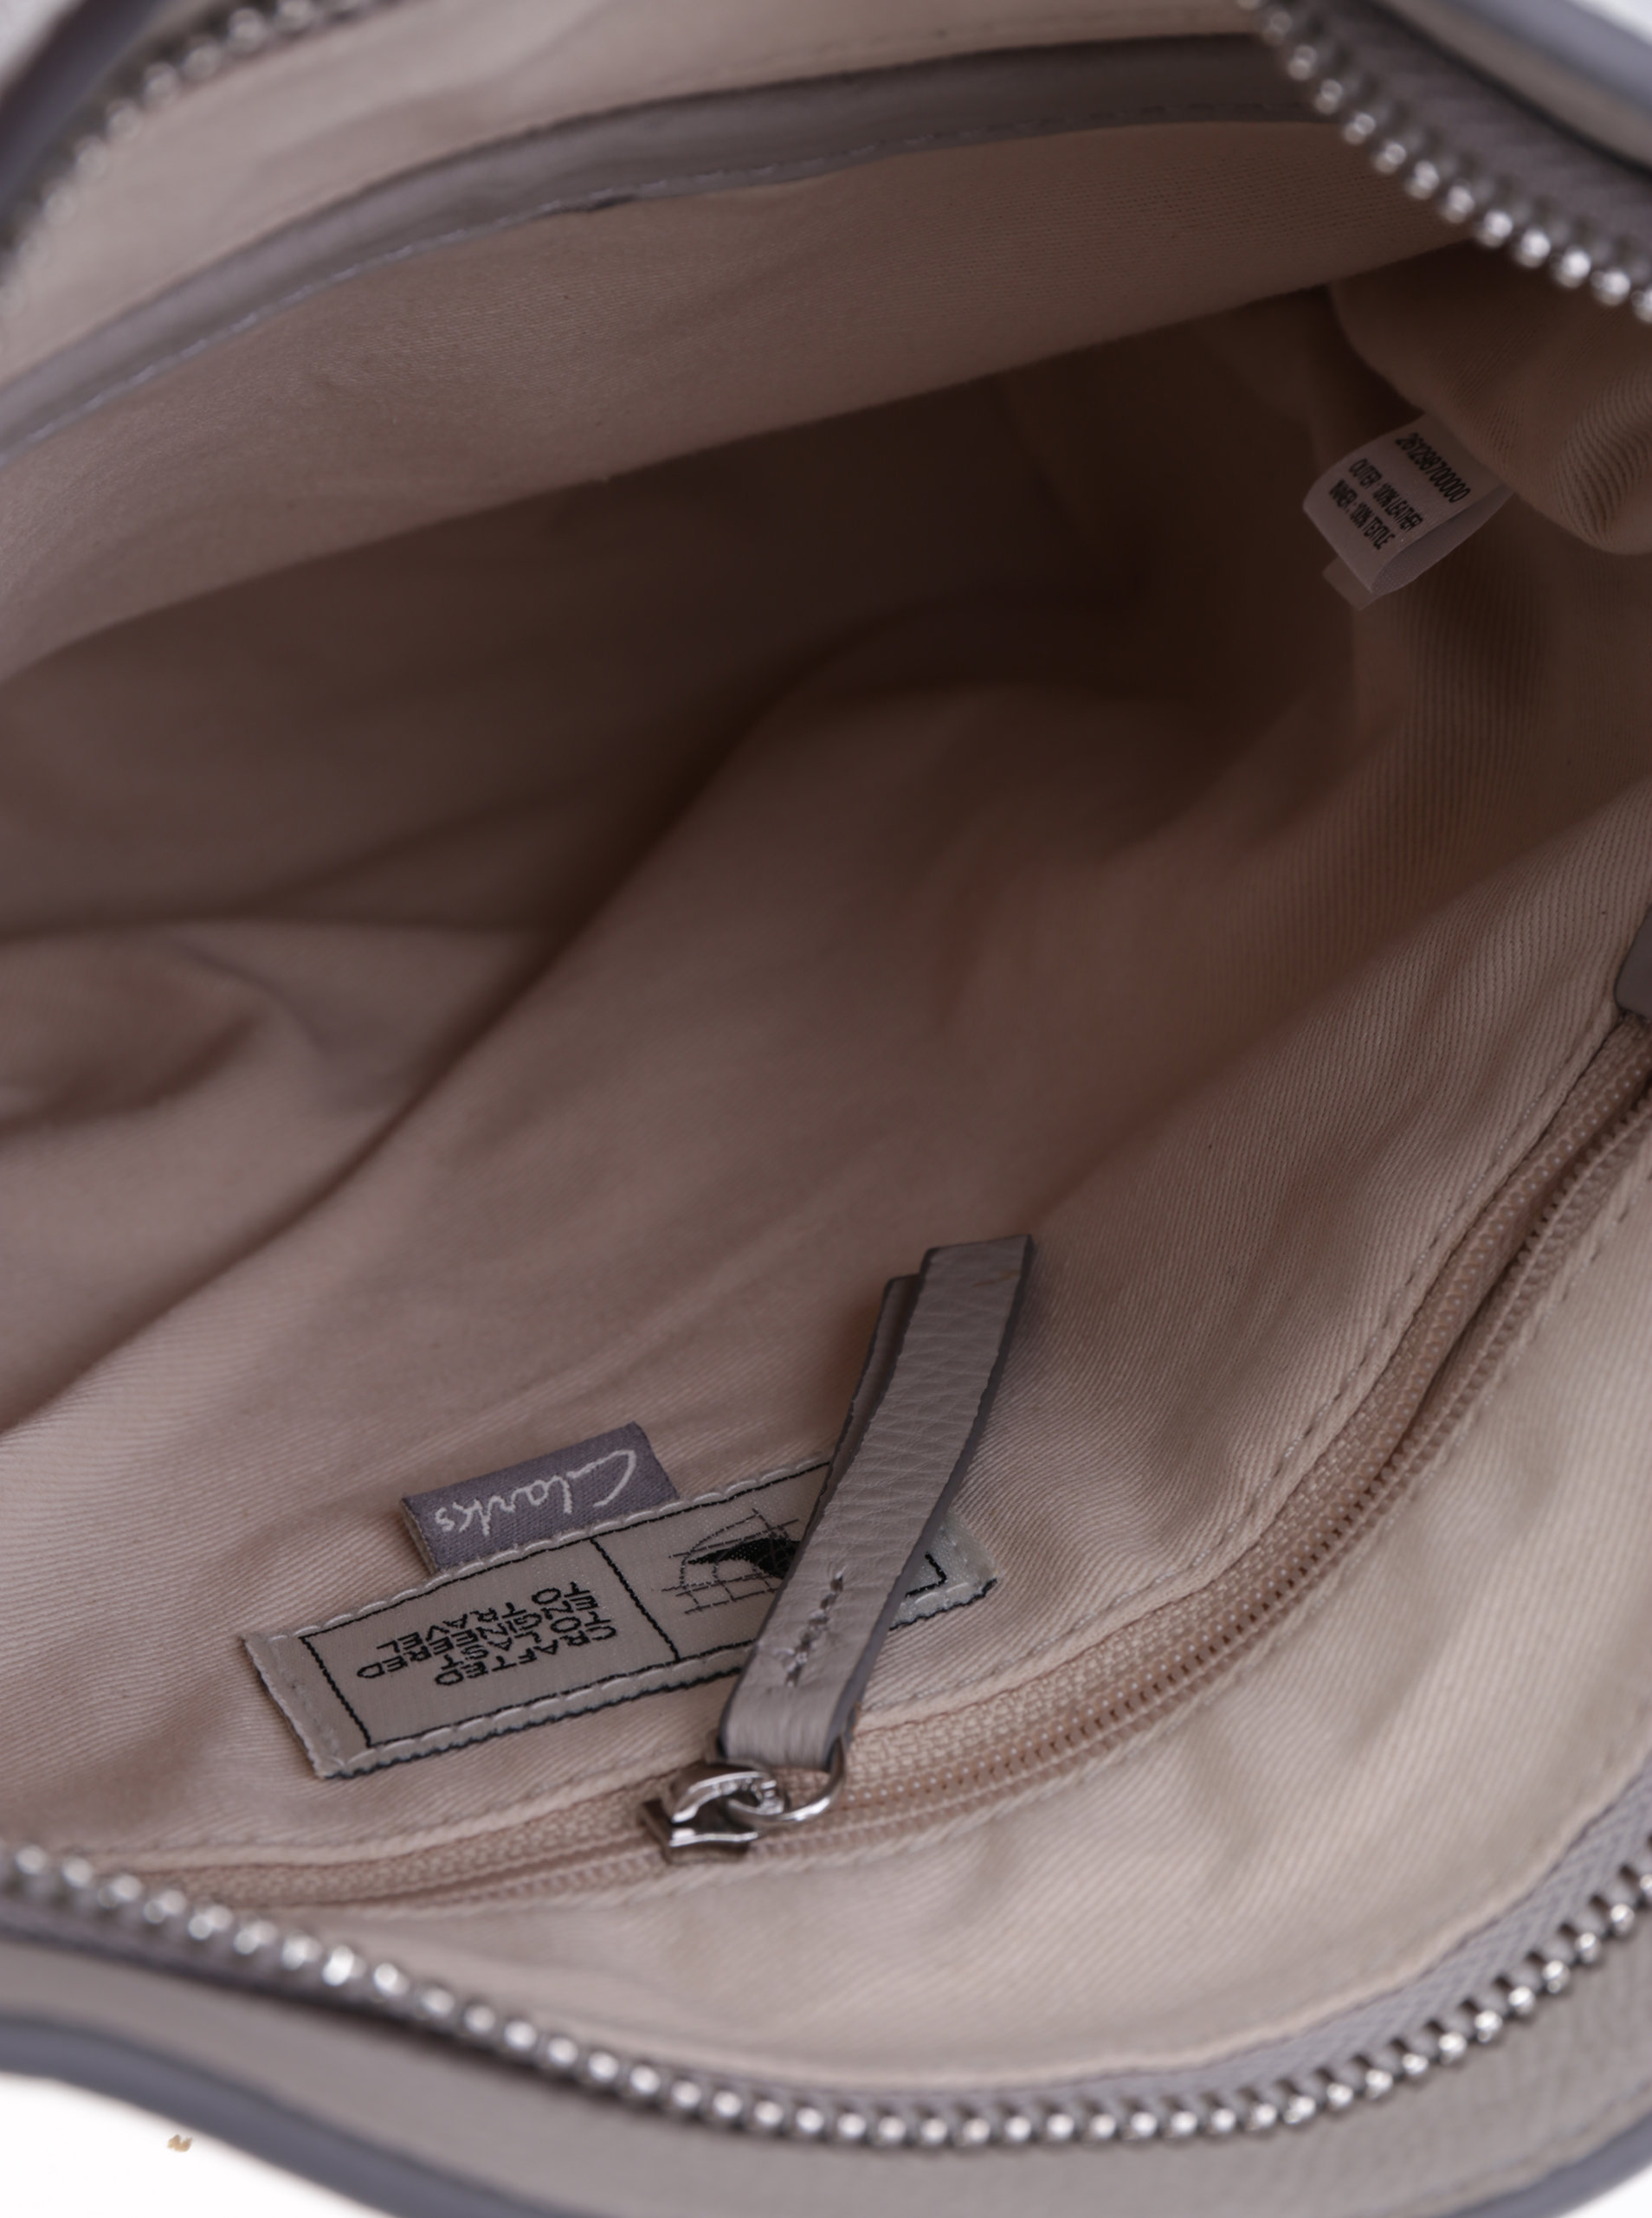 f5c2da1de Béžová kožená crossbody kabelka Clarks Topsham Jewel   ZOOT.sk